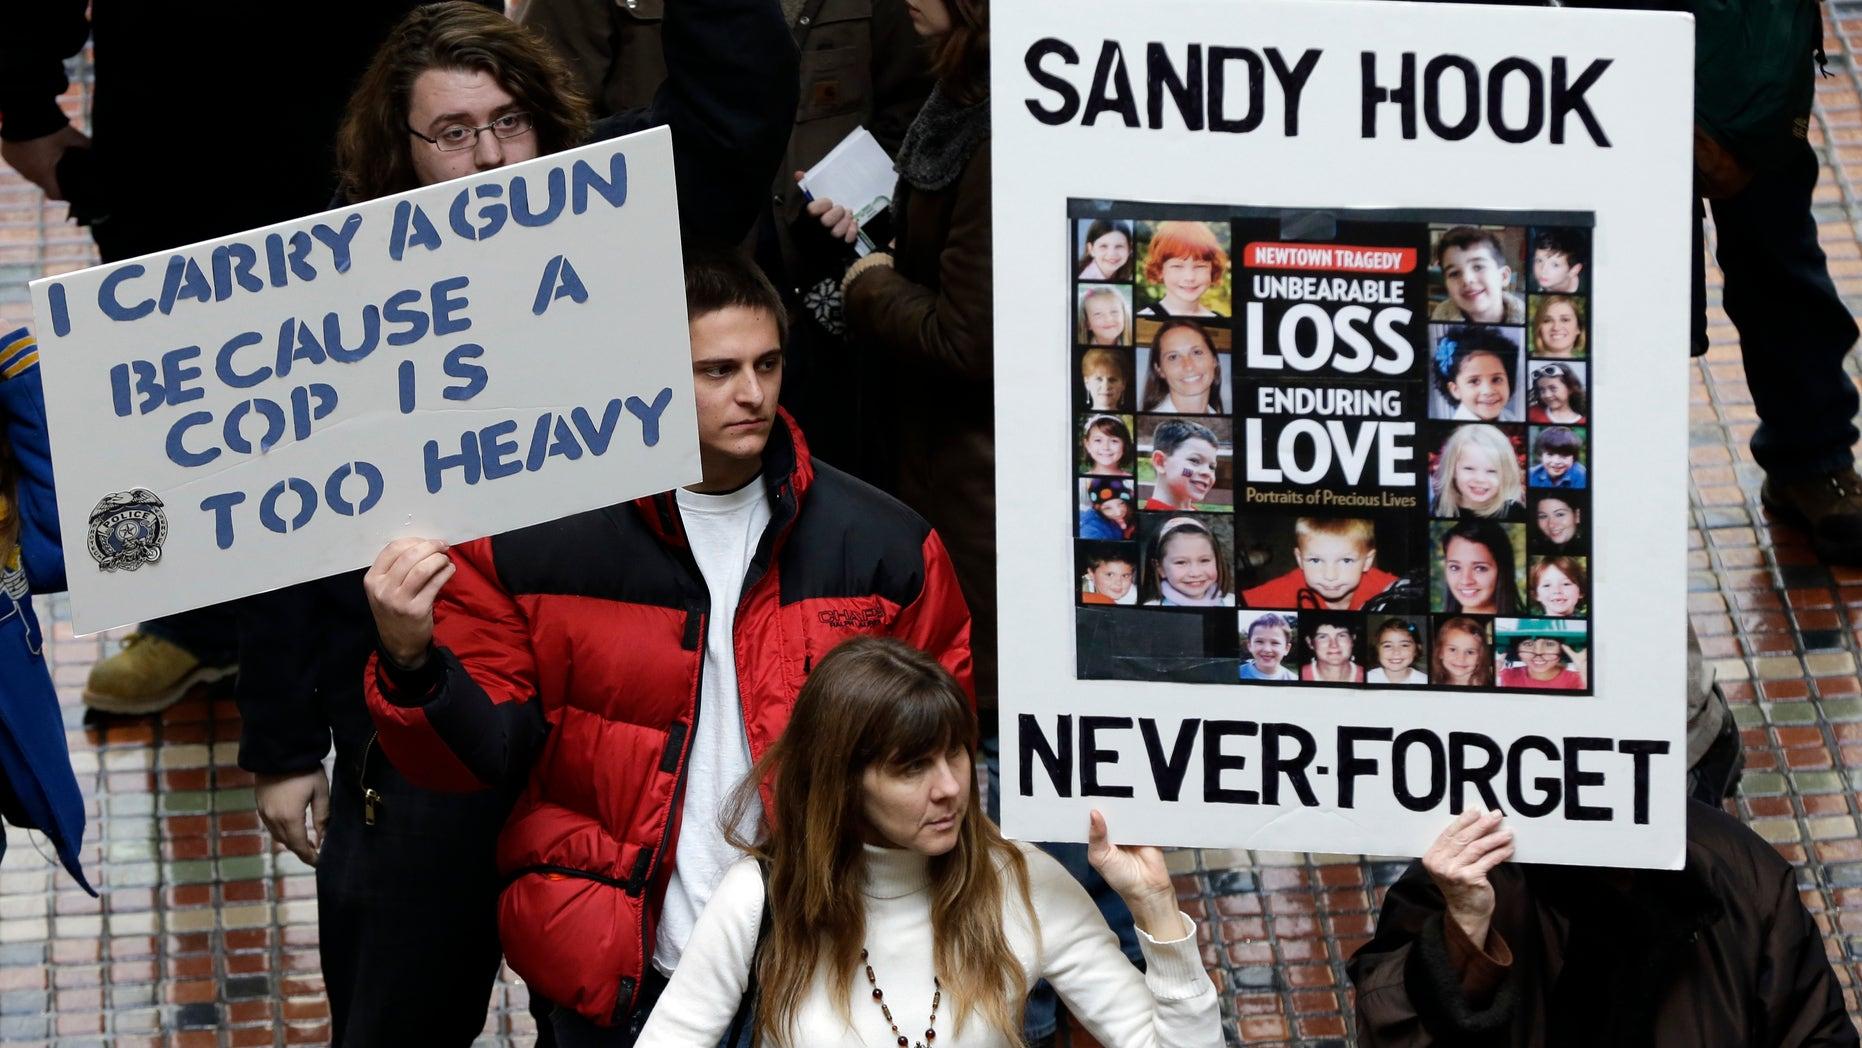 Jan. 23, 2013: Gun rights and gun control advocates demonstrate in the Pennsylvania Capital building  in Harrisburg, Pa.